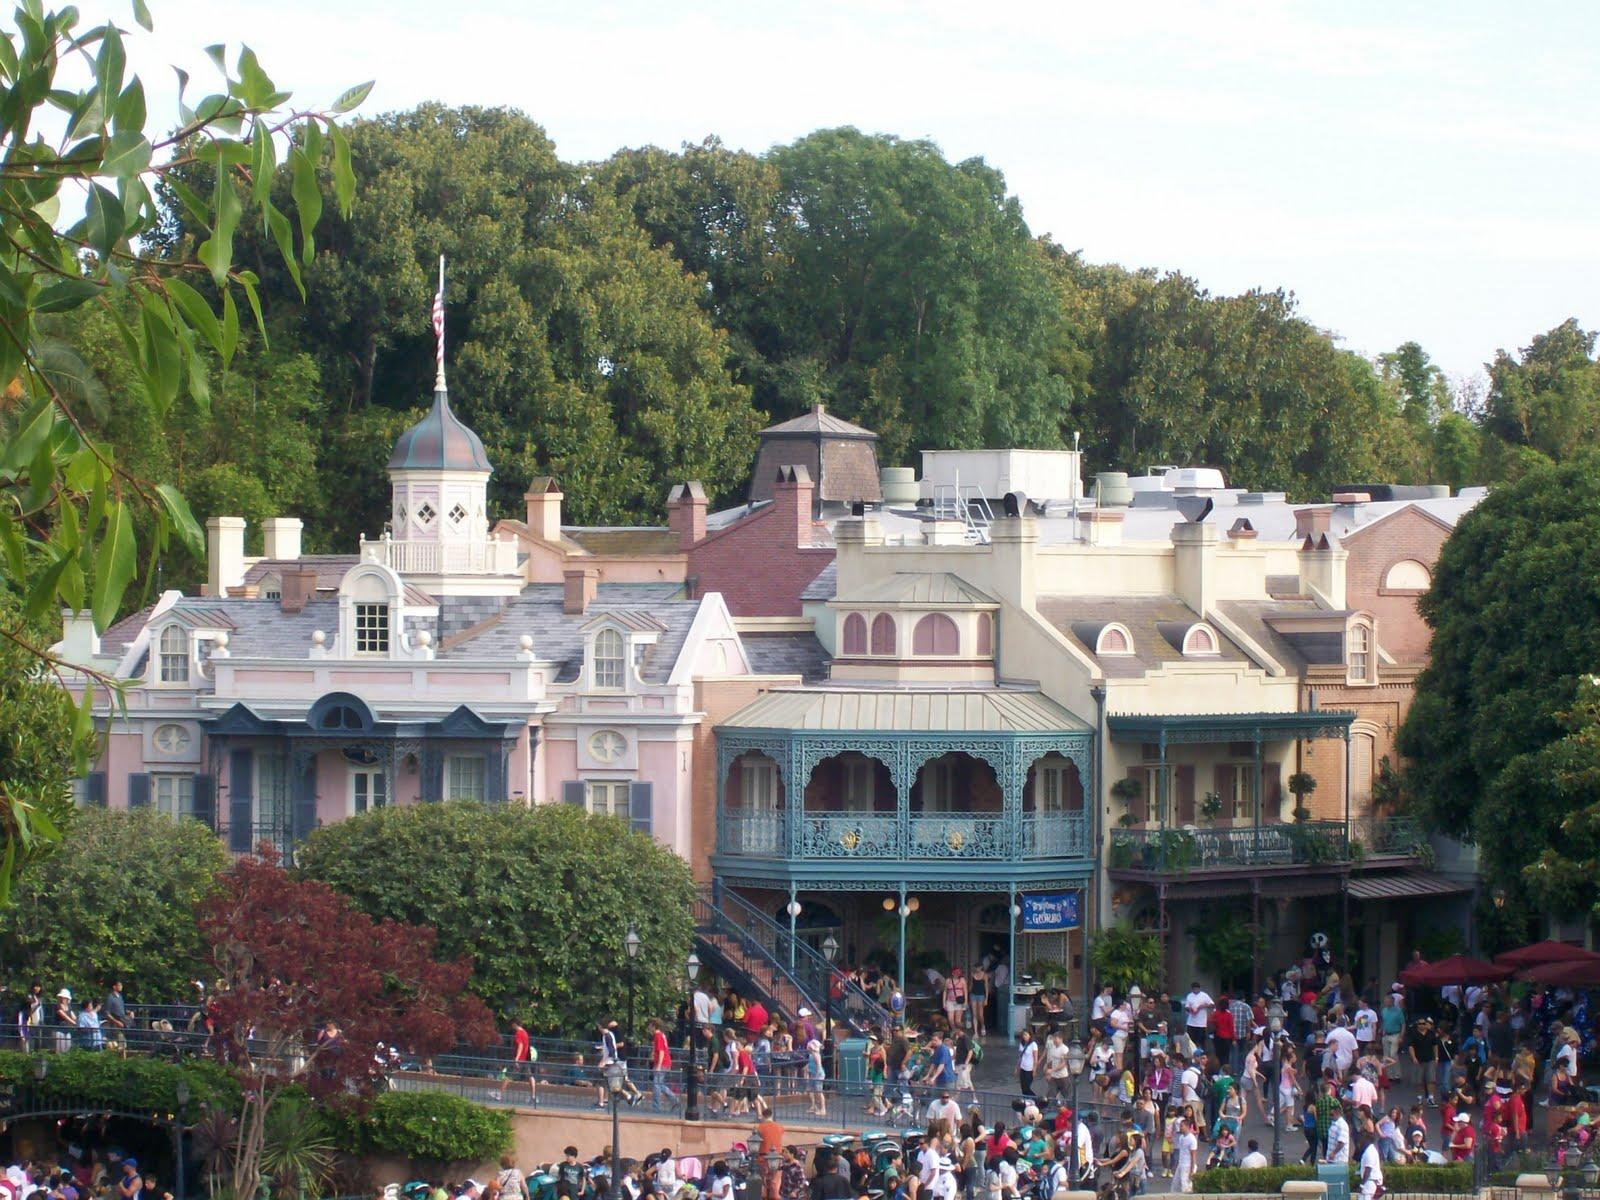 http://2.bp.blogspot.com/_hFi4AZM6xqQ/TDrAXoK_wDI/AAAAAAAAAA4/dxGtGzsyybI/s1600/Disney+165.JPG